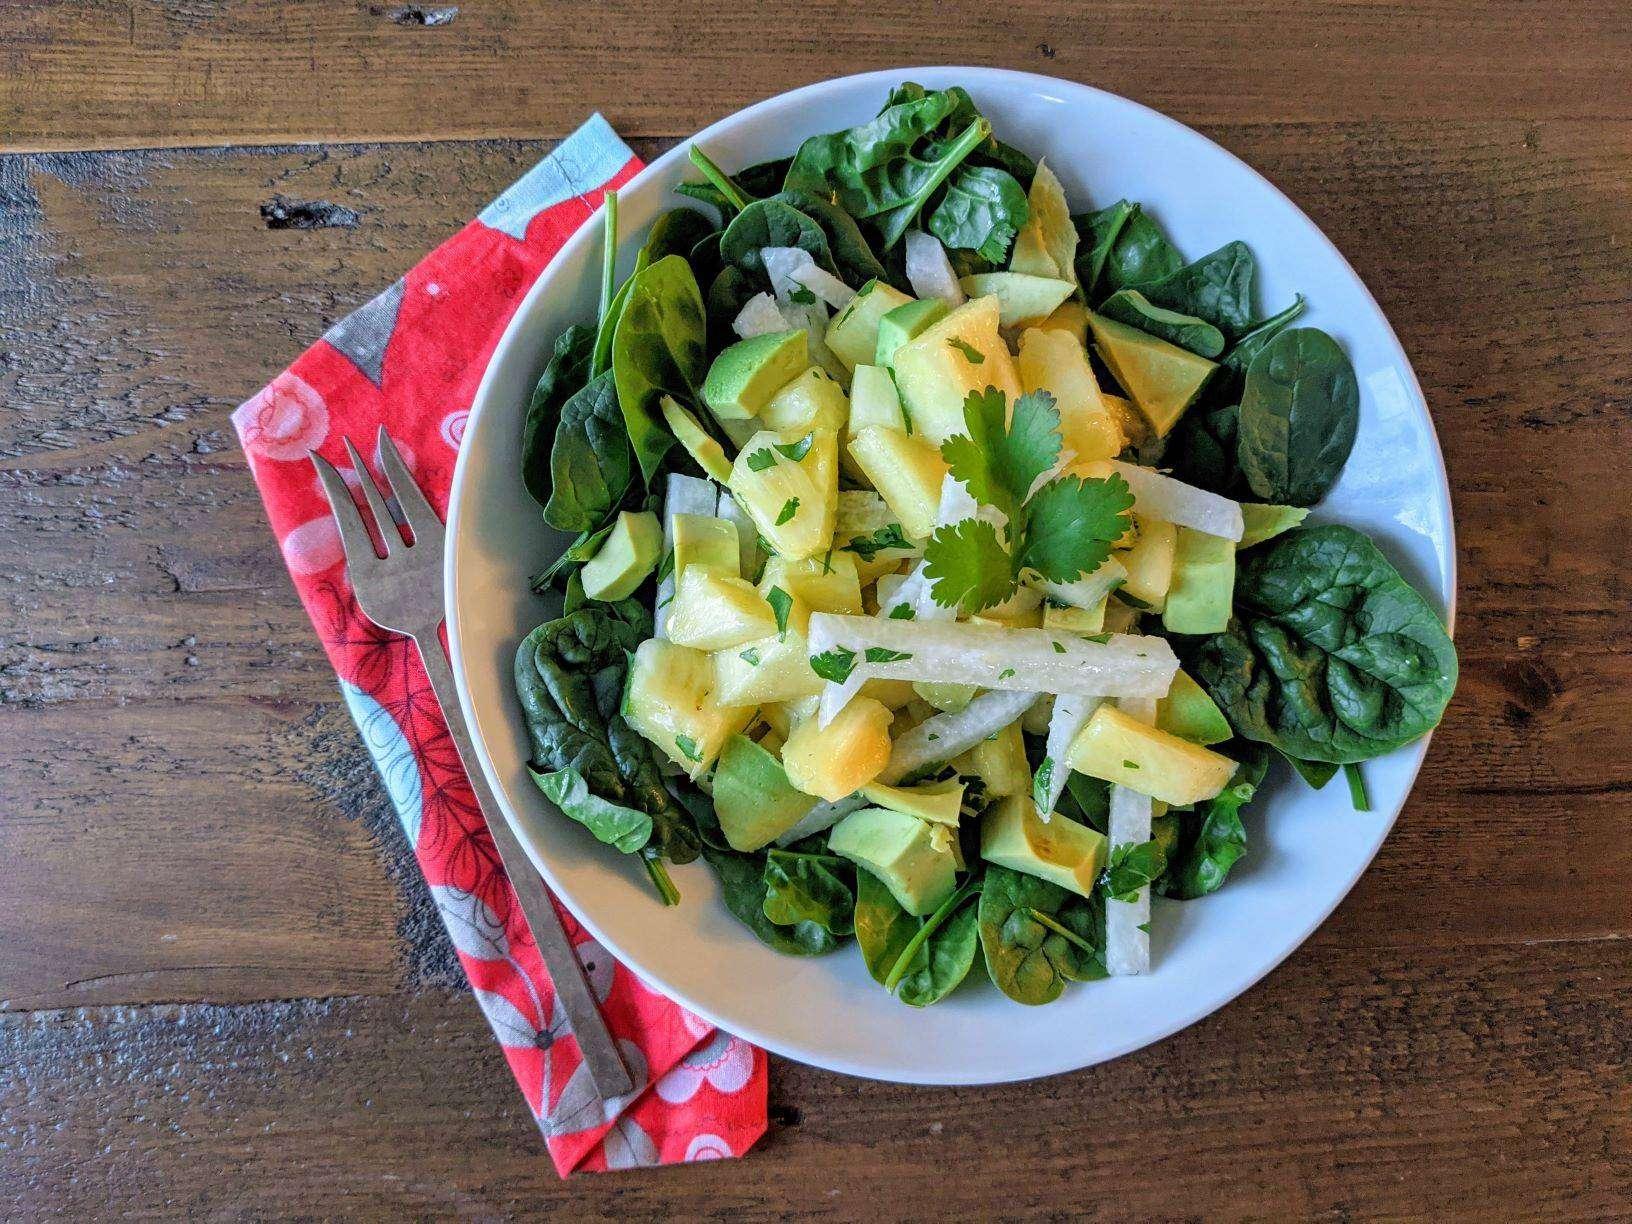 Jicama and Pineapple Salad in a Cilantro Vinaigrette